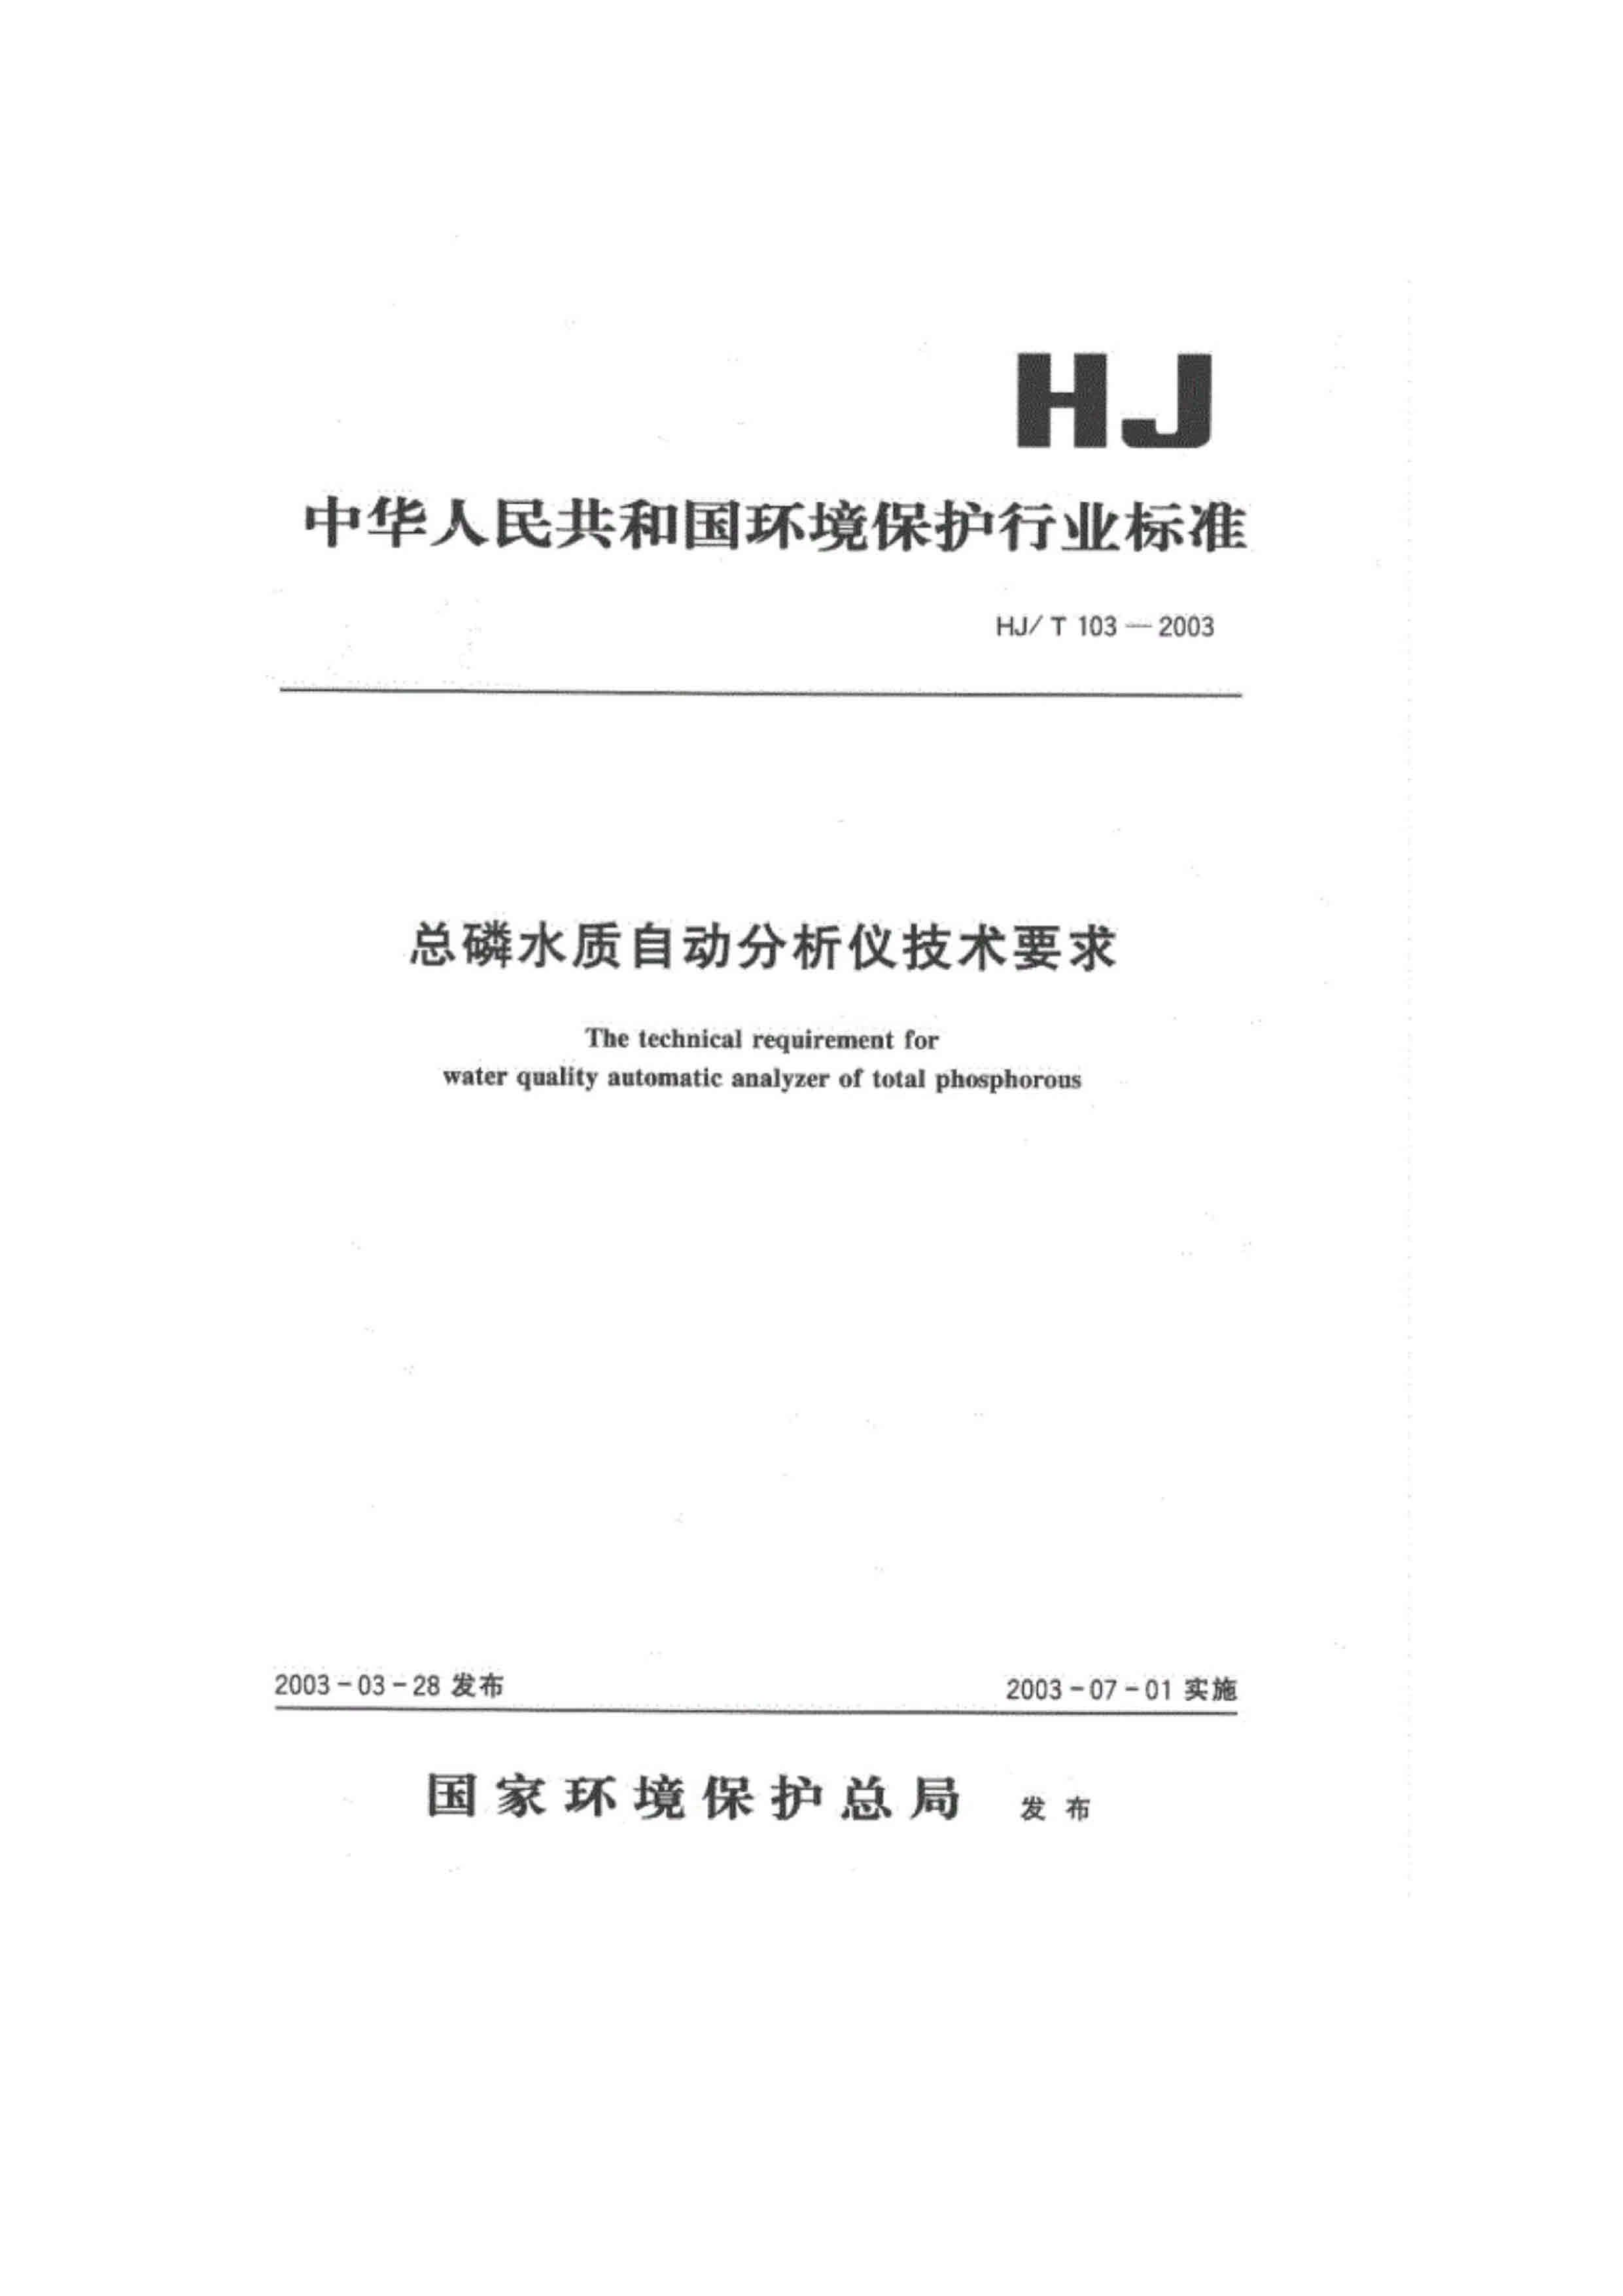 HJ-T103-2003 环境保护产品技术要求 总磷水质自动分析仪技术要求 下载